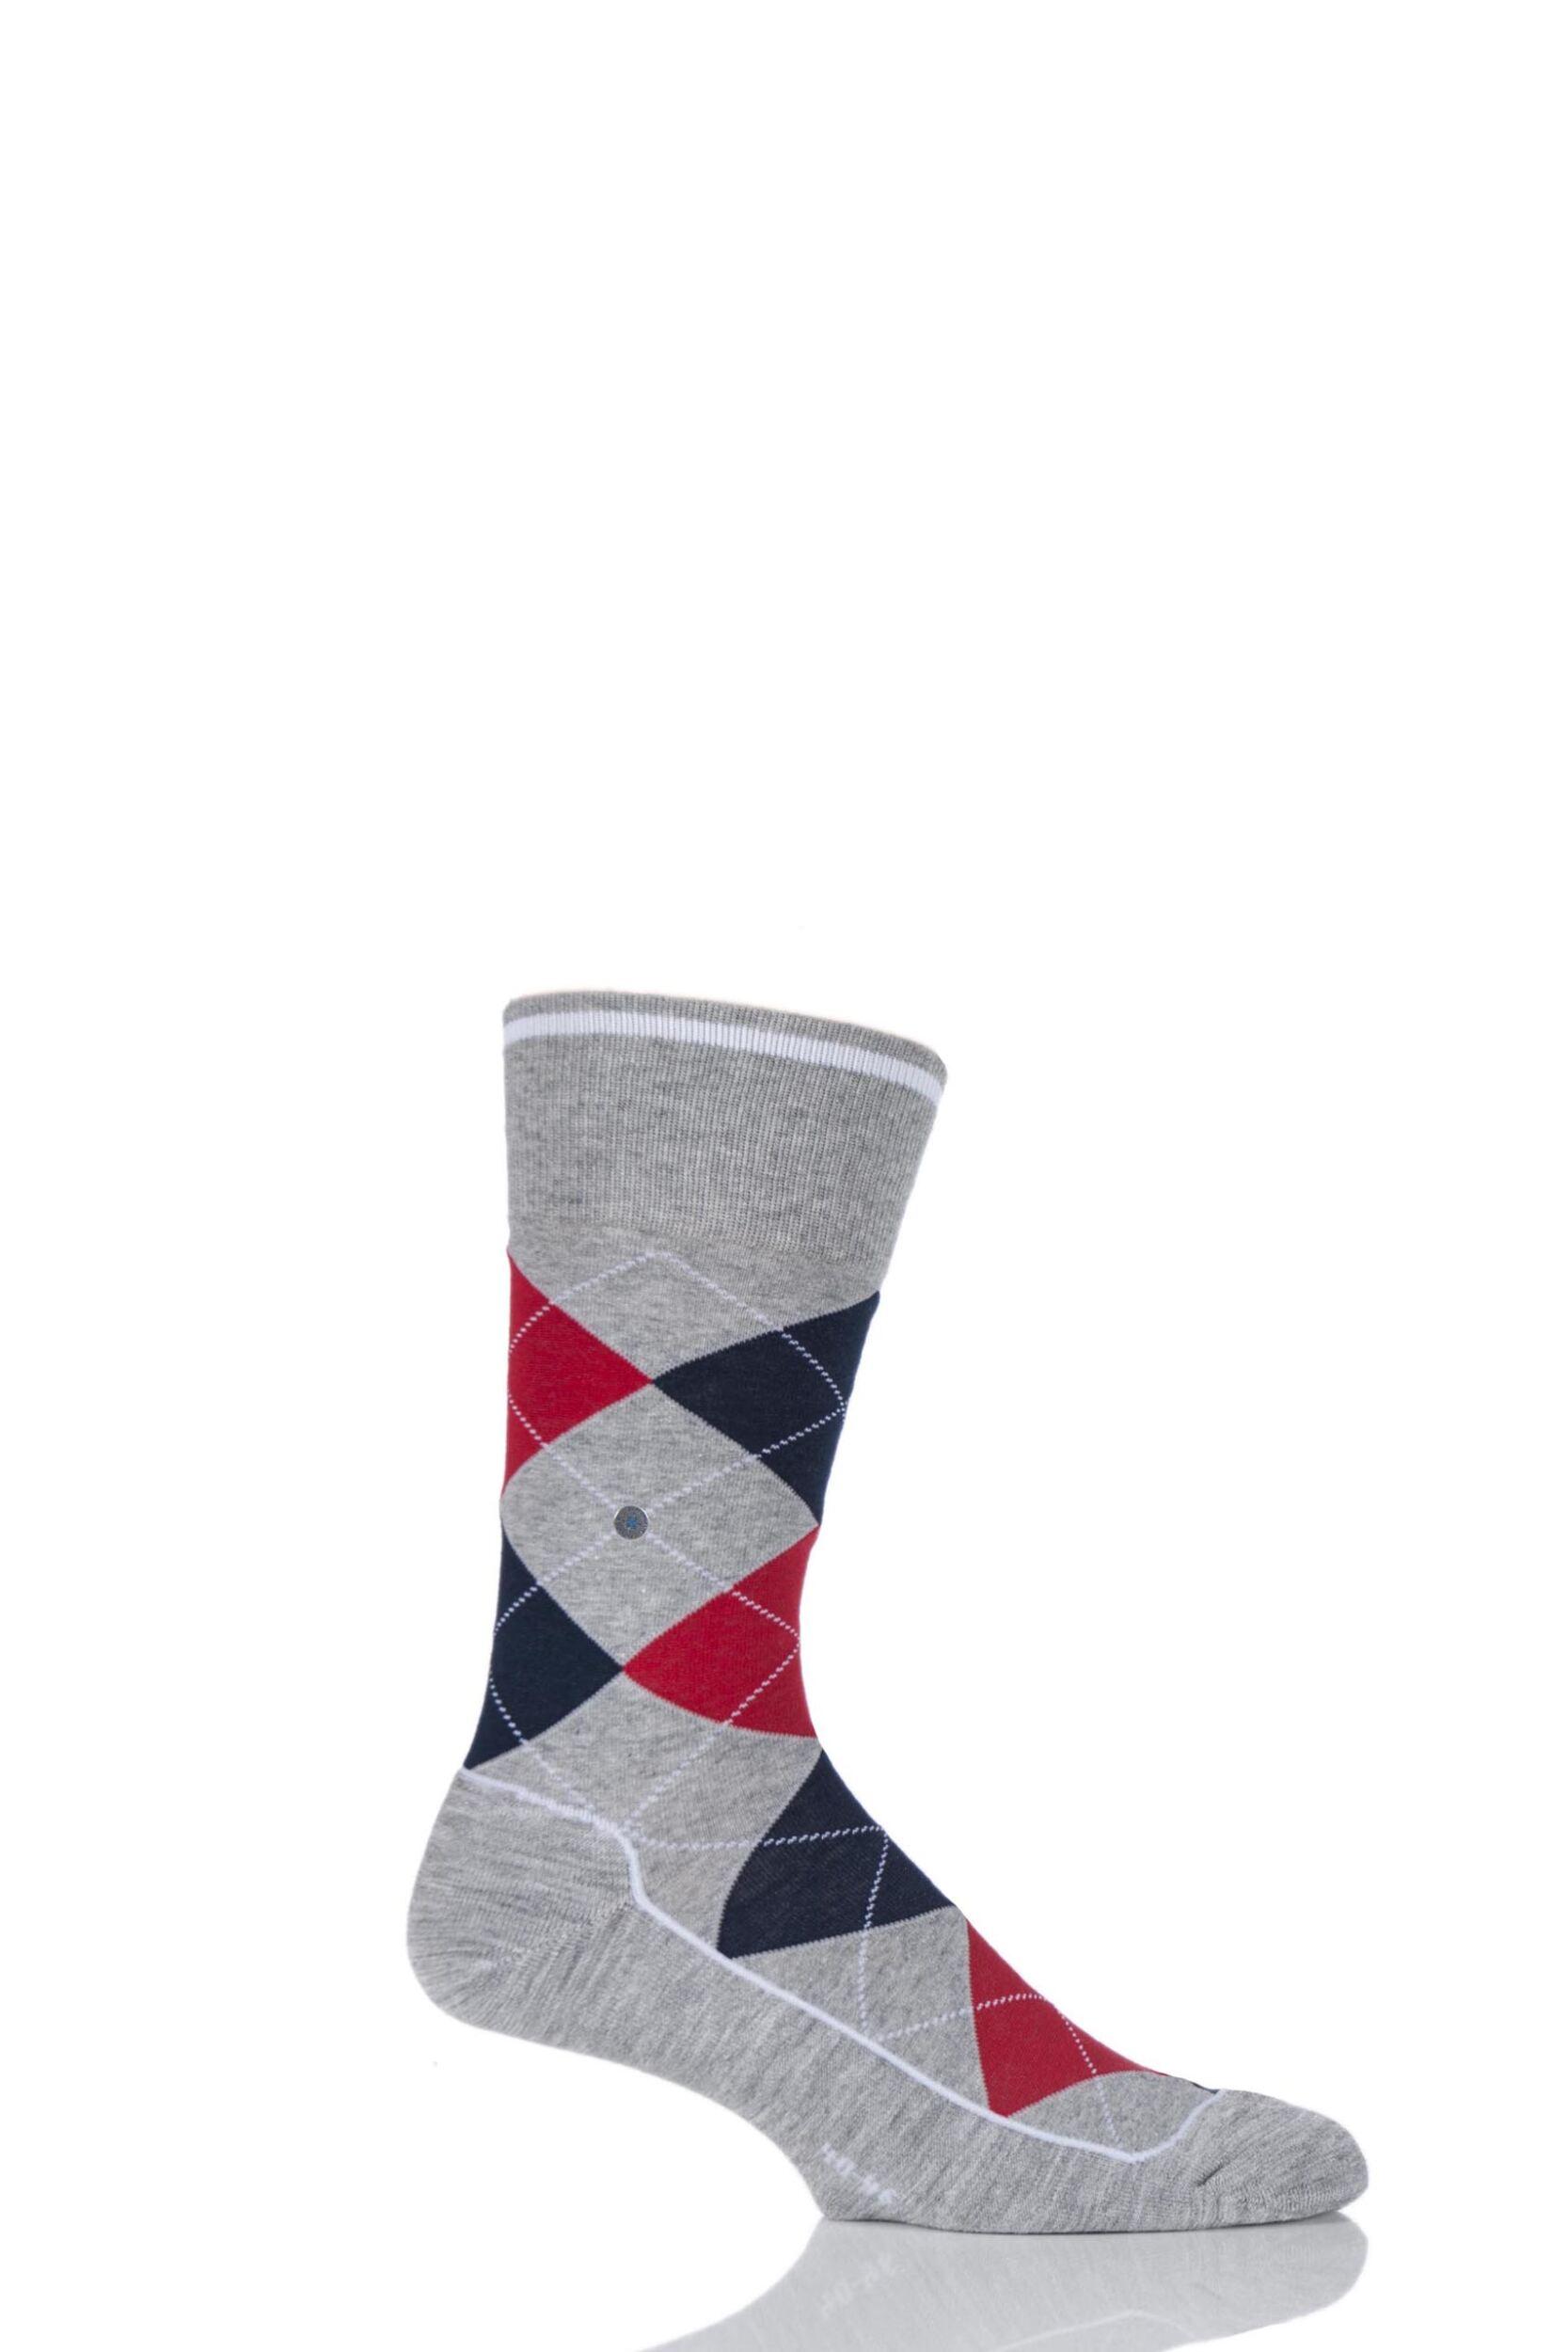 Mens 1 Pair Burlington Dorset Cotton Golf Argyle Socks